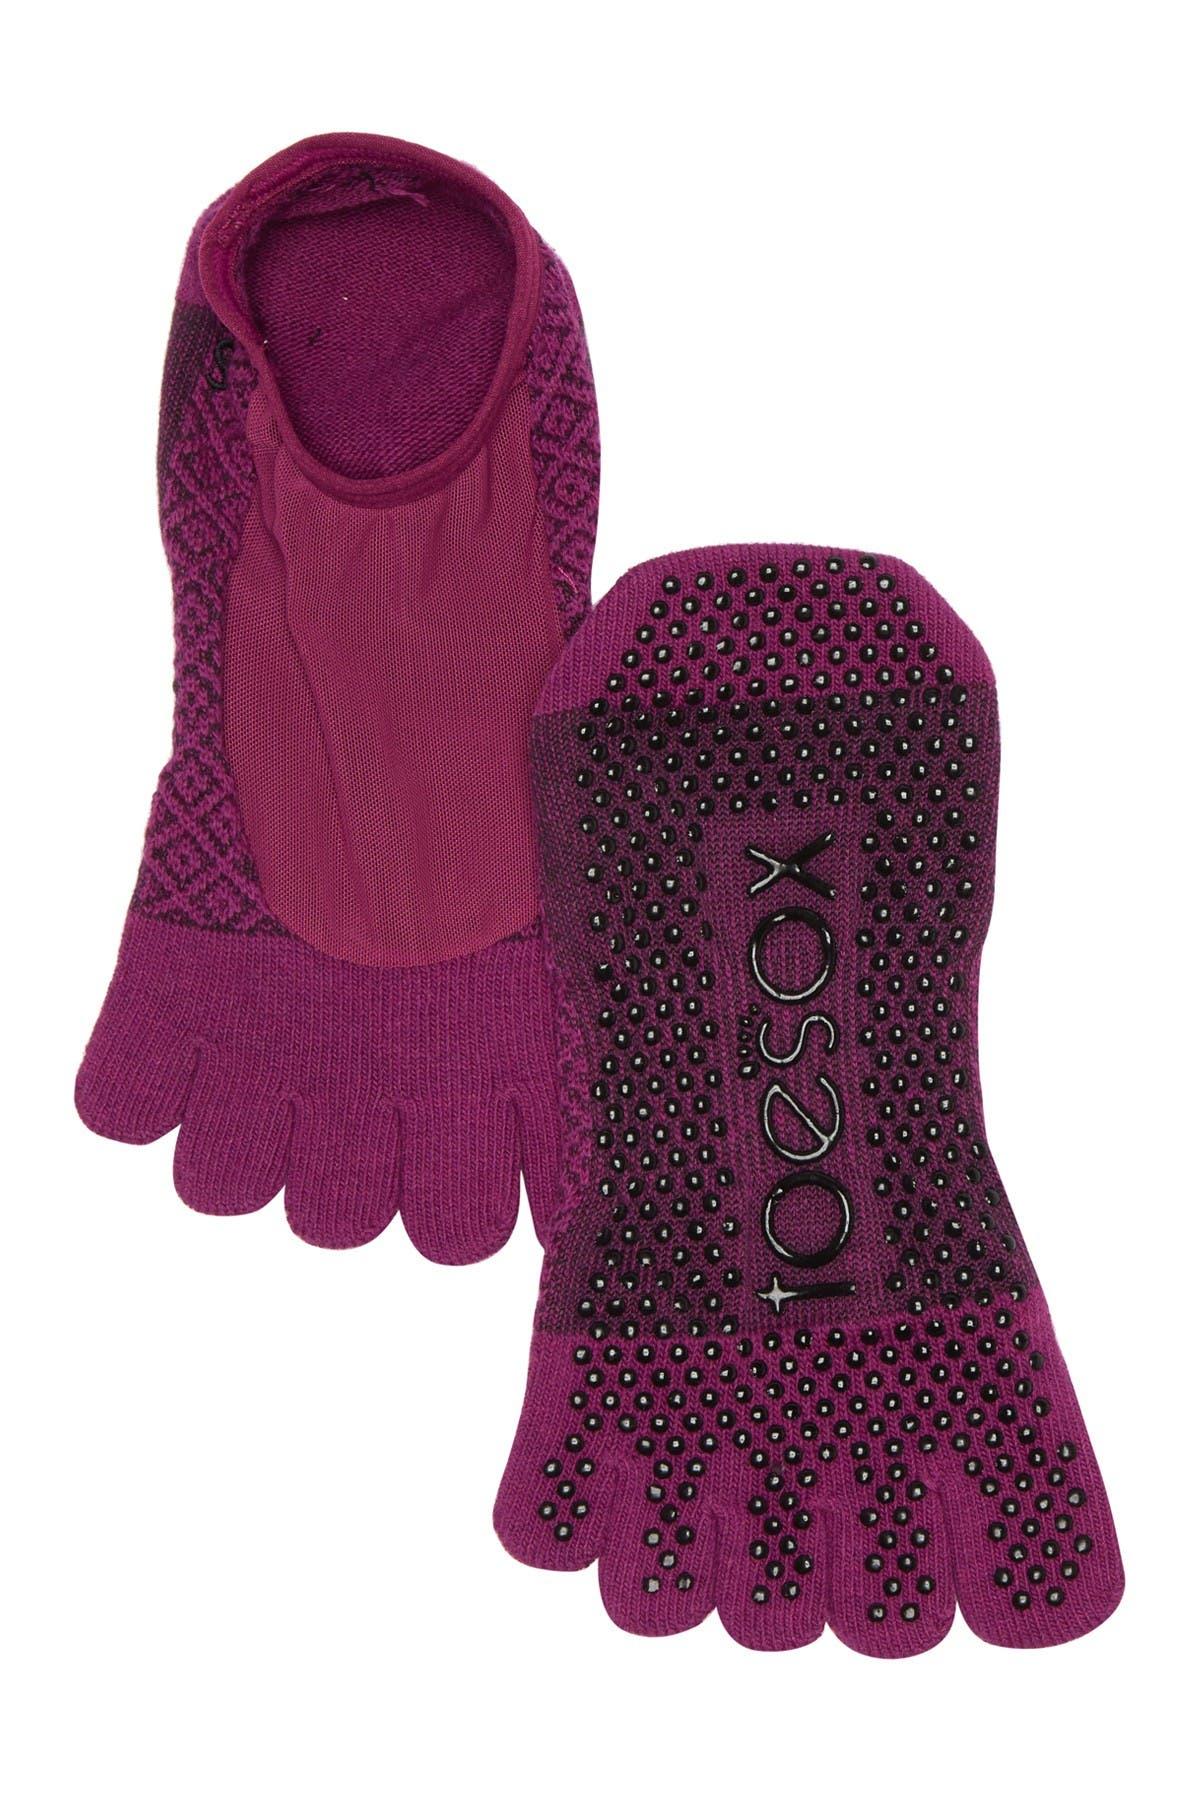 Image of ToeSox Full Toe Luna Grip Socks